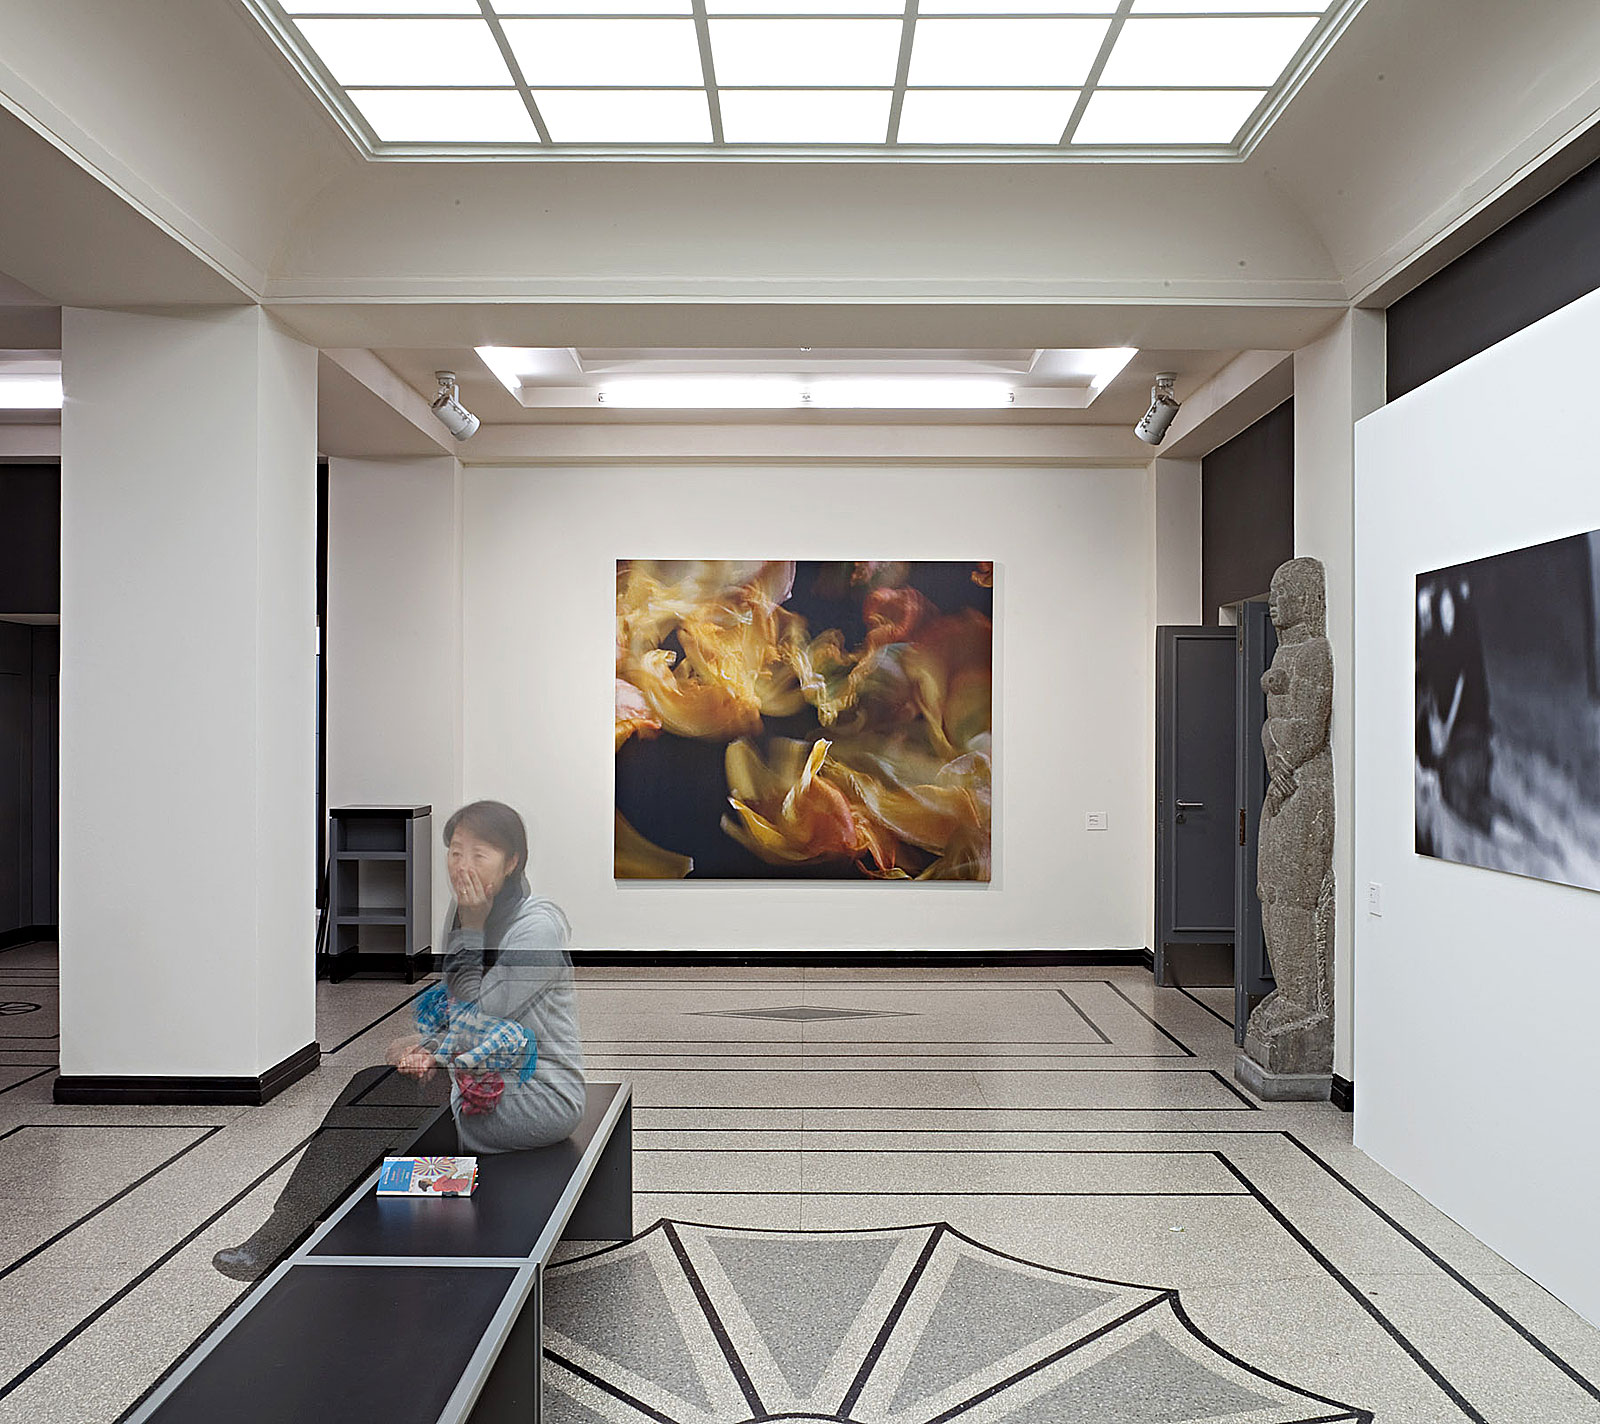 Unscharf - nach Gerhard Richter (12.38 Uhr, 10.2.2011)